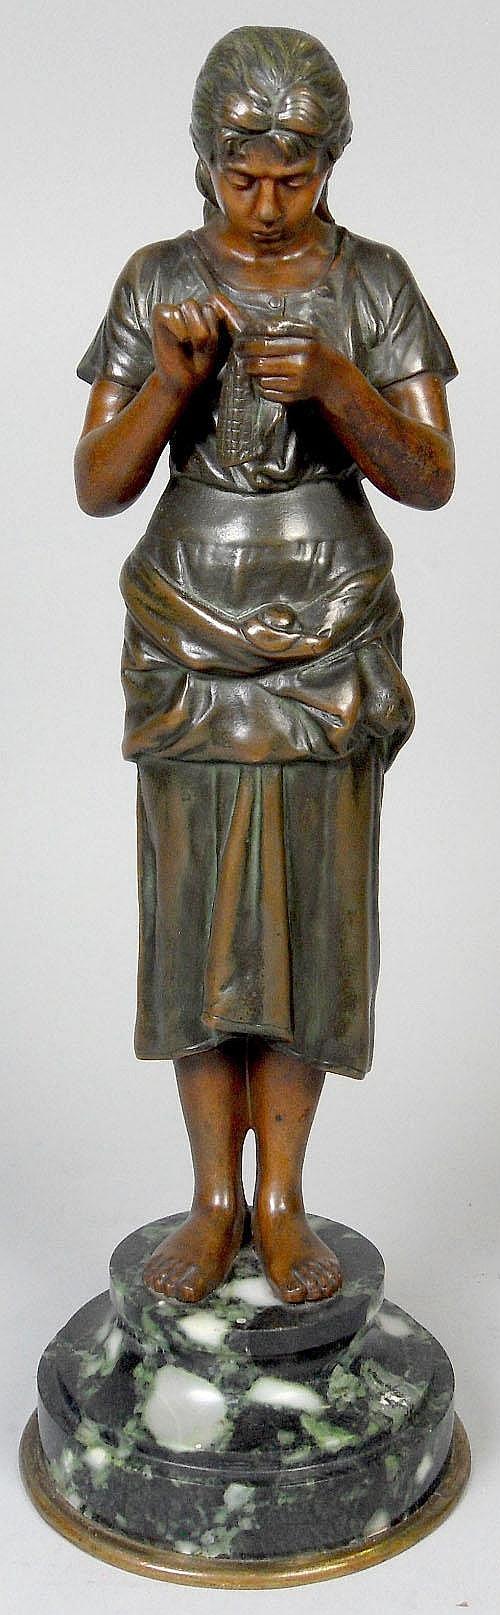 Alphonse De Tombay (1843-1918), a full length